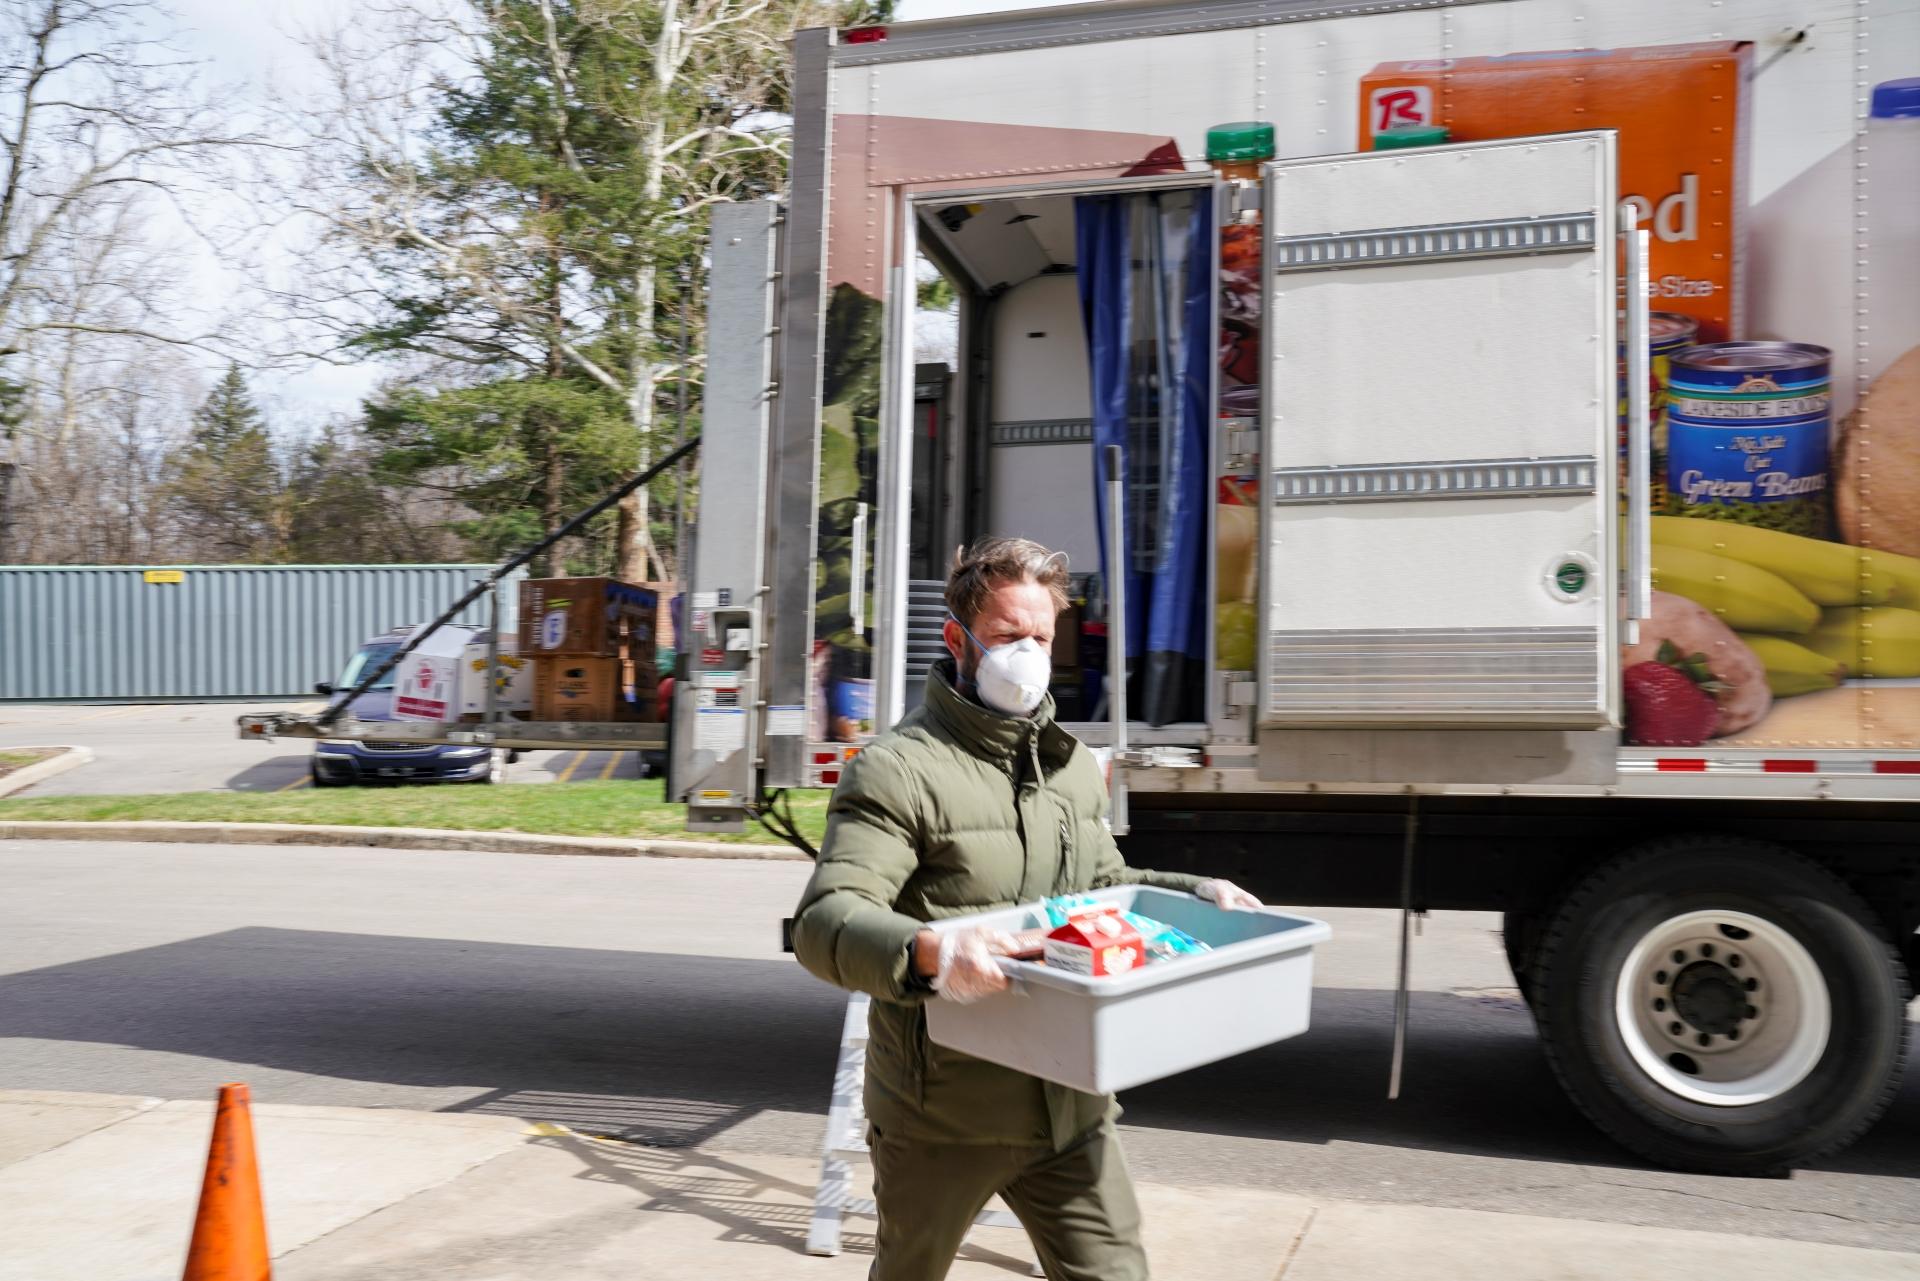 Volunteer delivers groceries from the My Neighborhood Mobile Grocery truck.